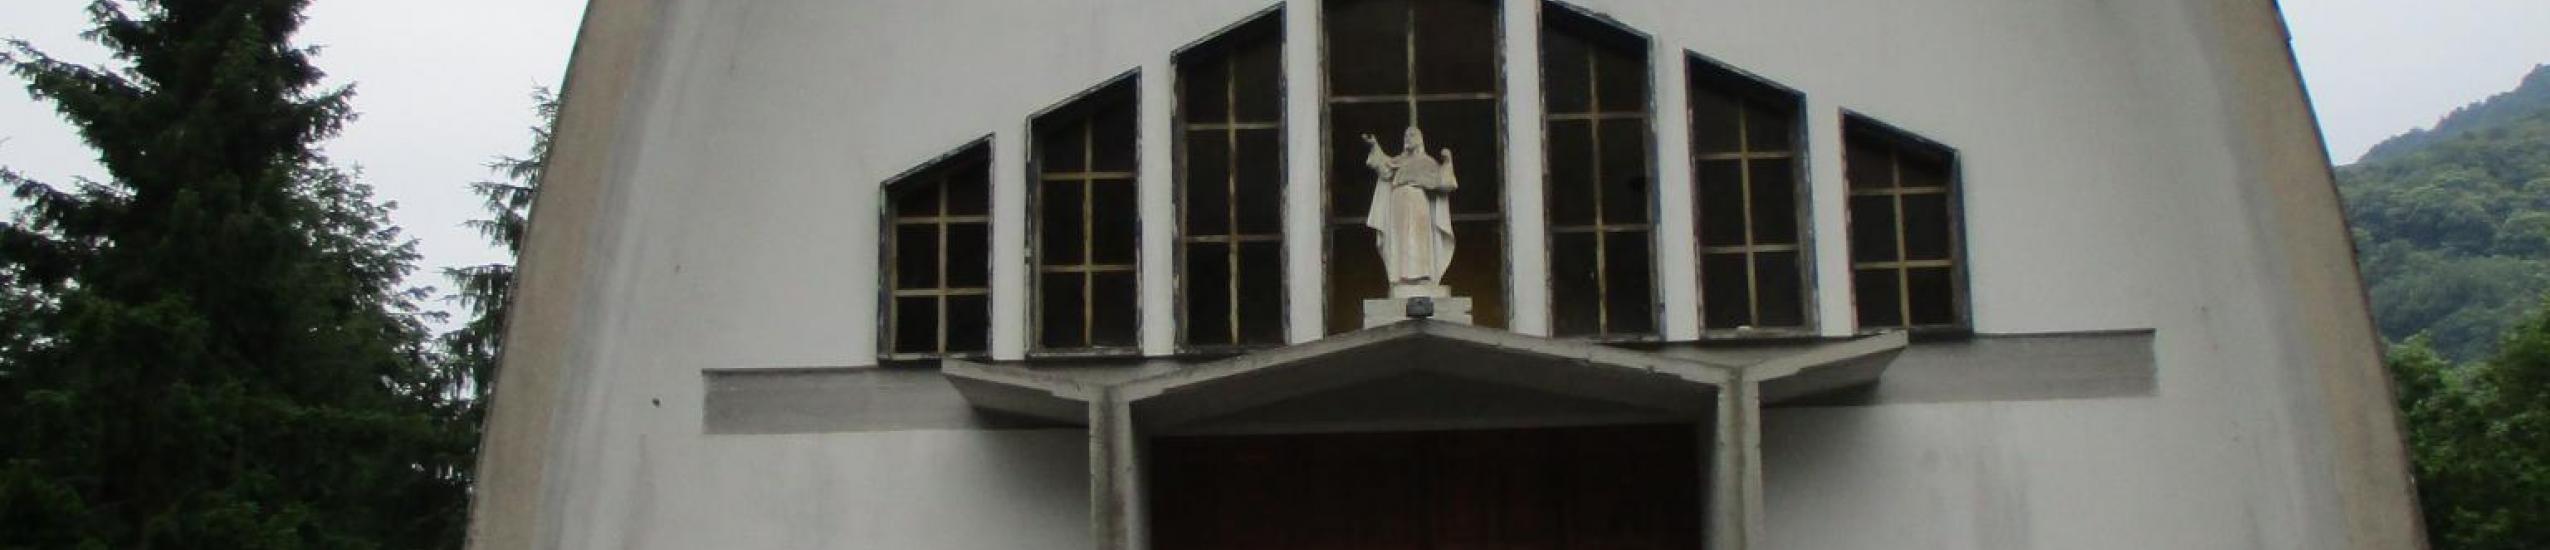 Parrocchia San Giacomo